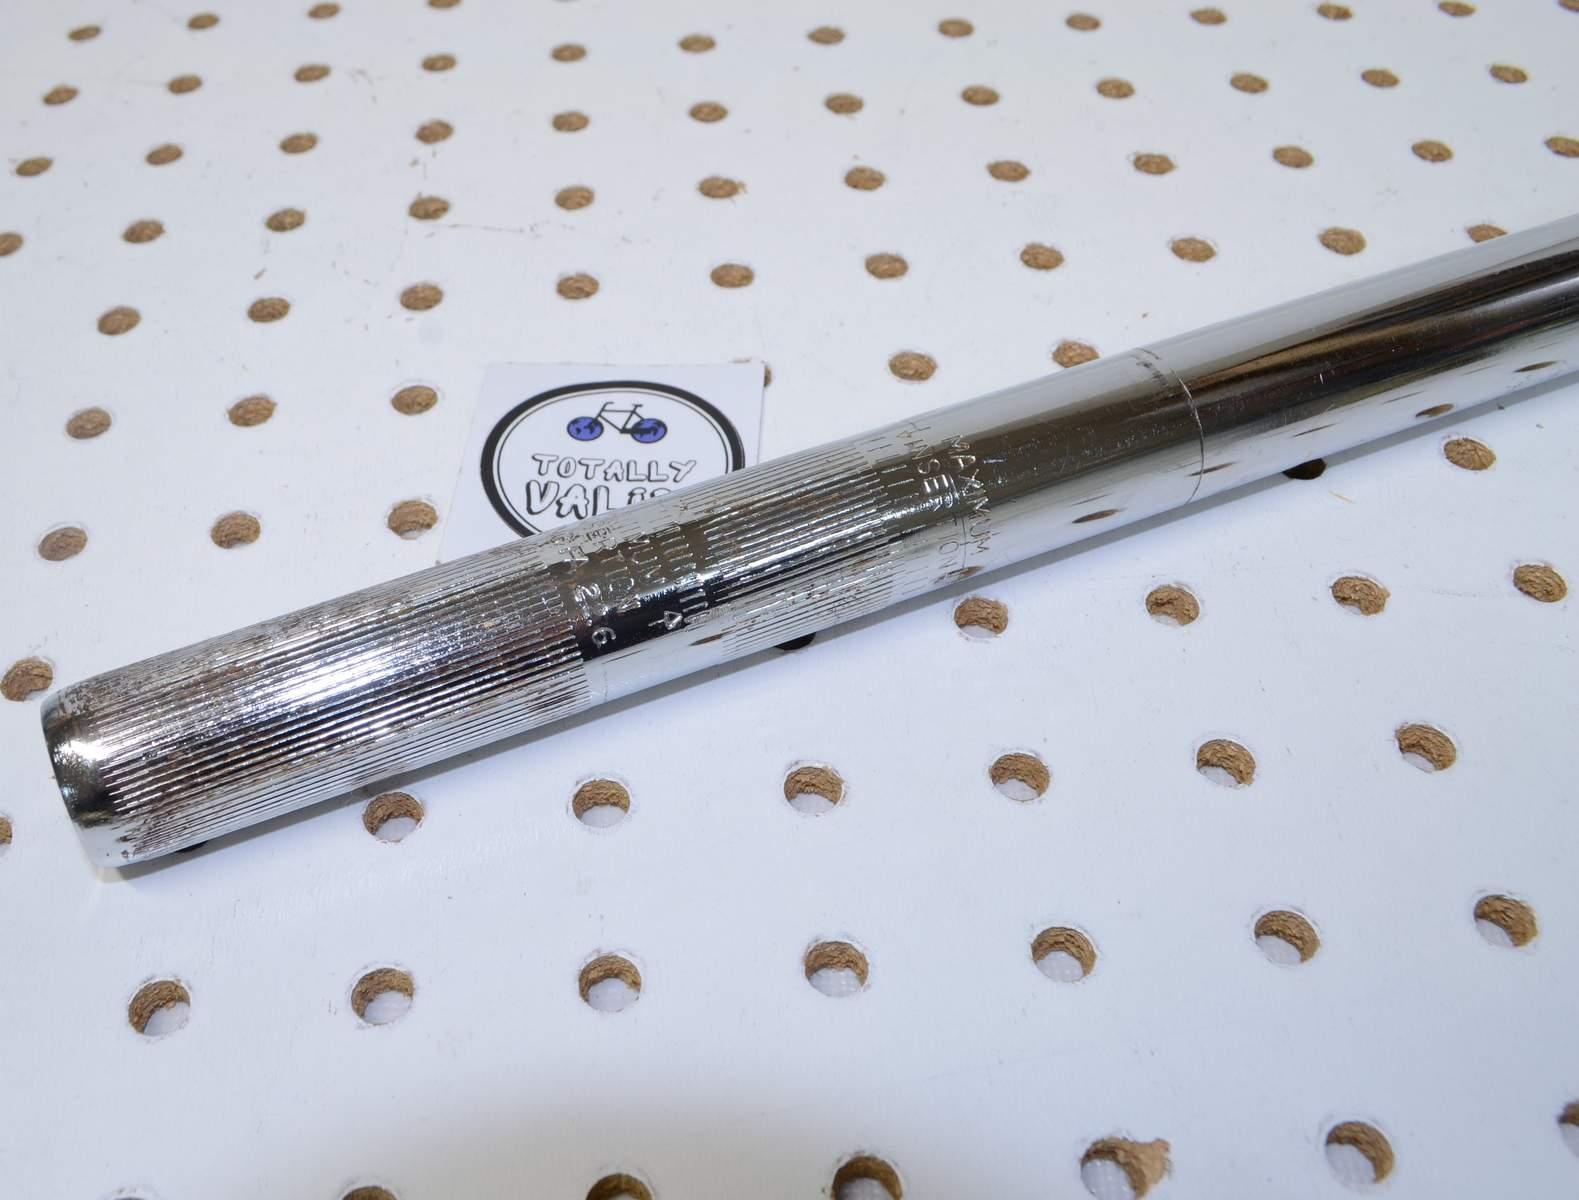 https://s3.amazonaws.com/uploads.bmxmuseum.com/user-images/17782/mongoose-expert-22.6-seatpost-chrome.....45dceca1740.jpg